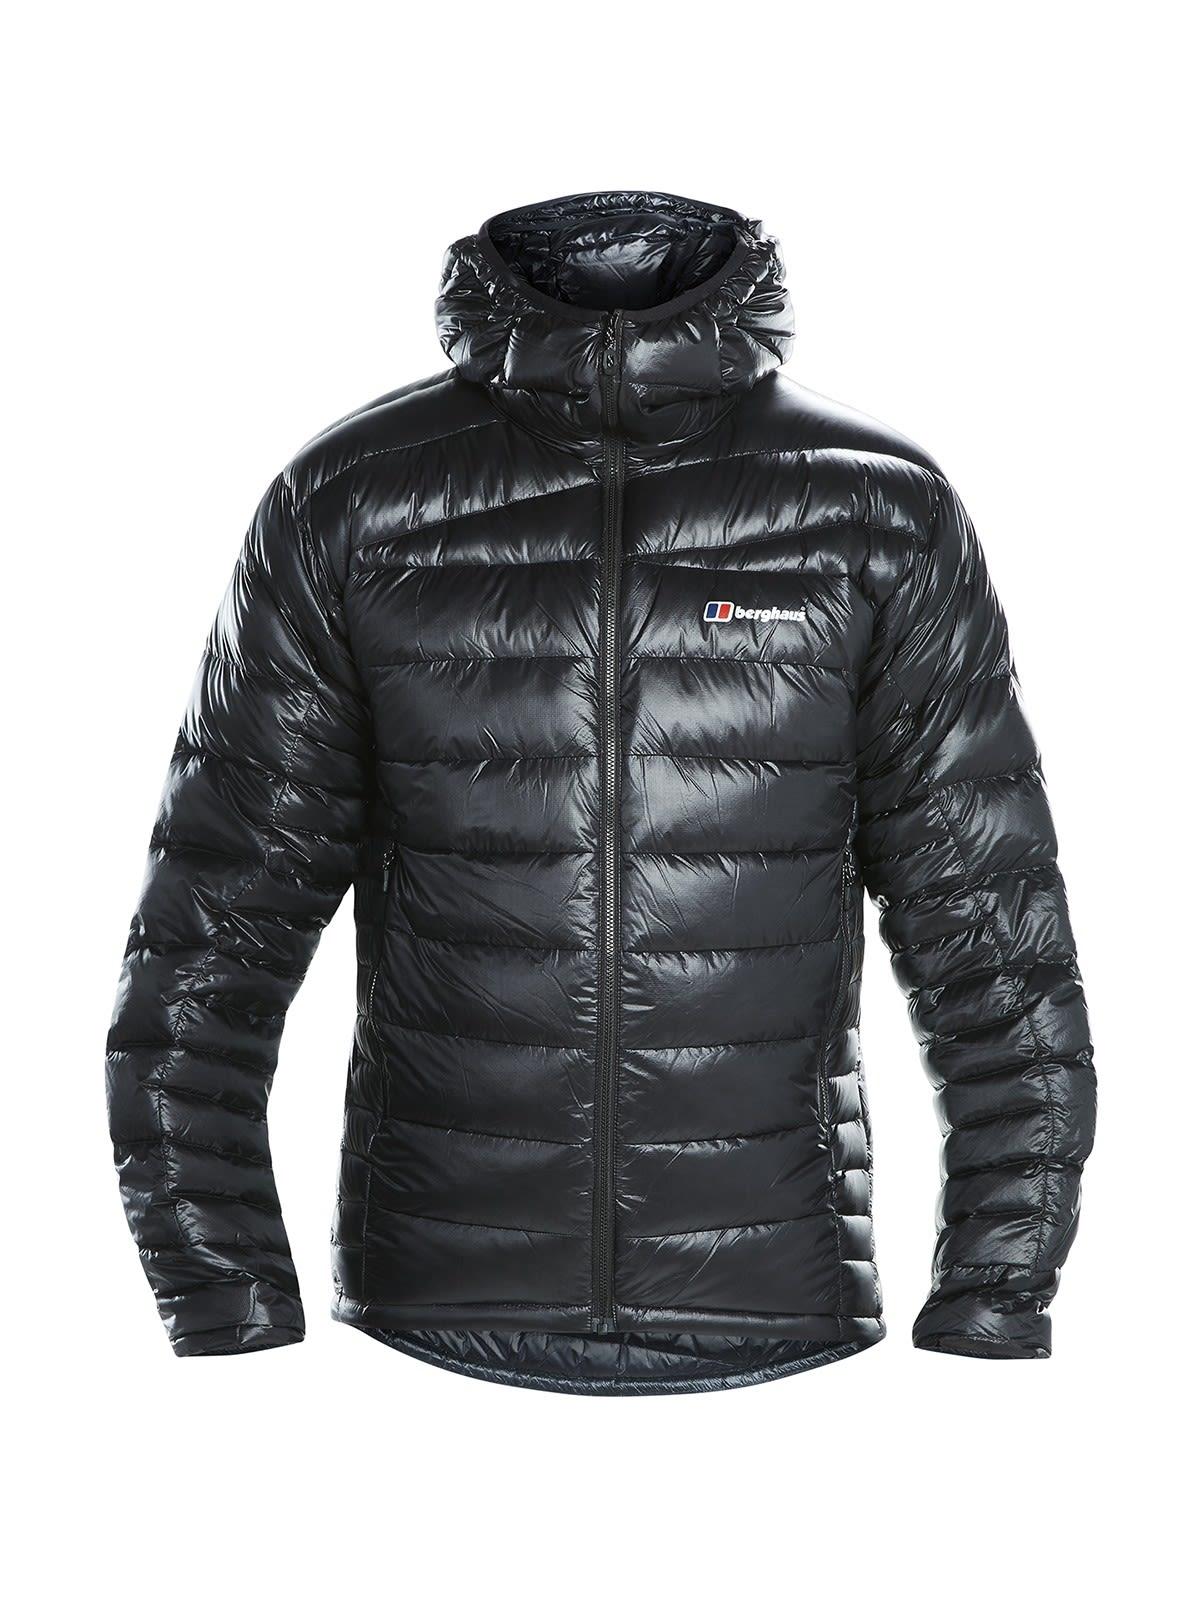 Berghaus Ramche Micro Down Jacket Schwarz, Male Daunen Daunenjacke, XL